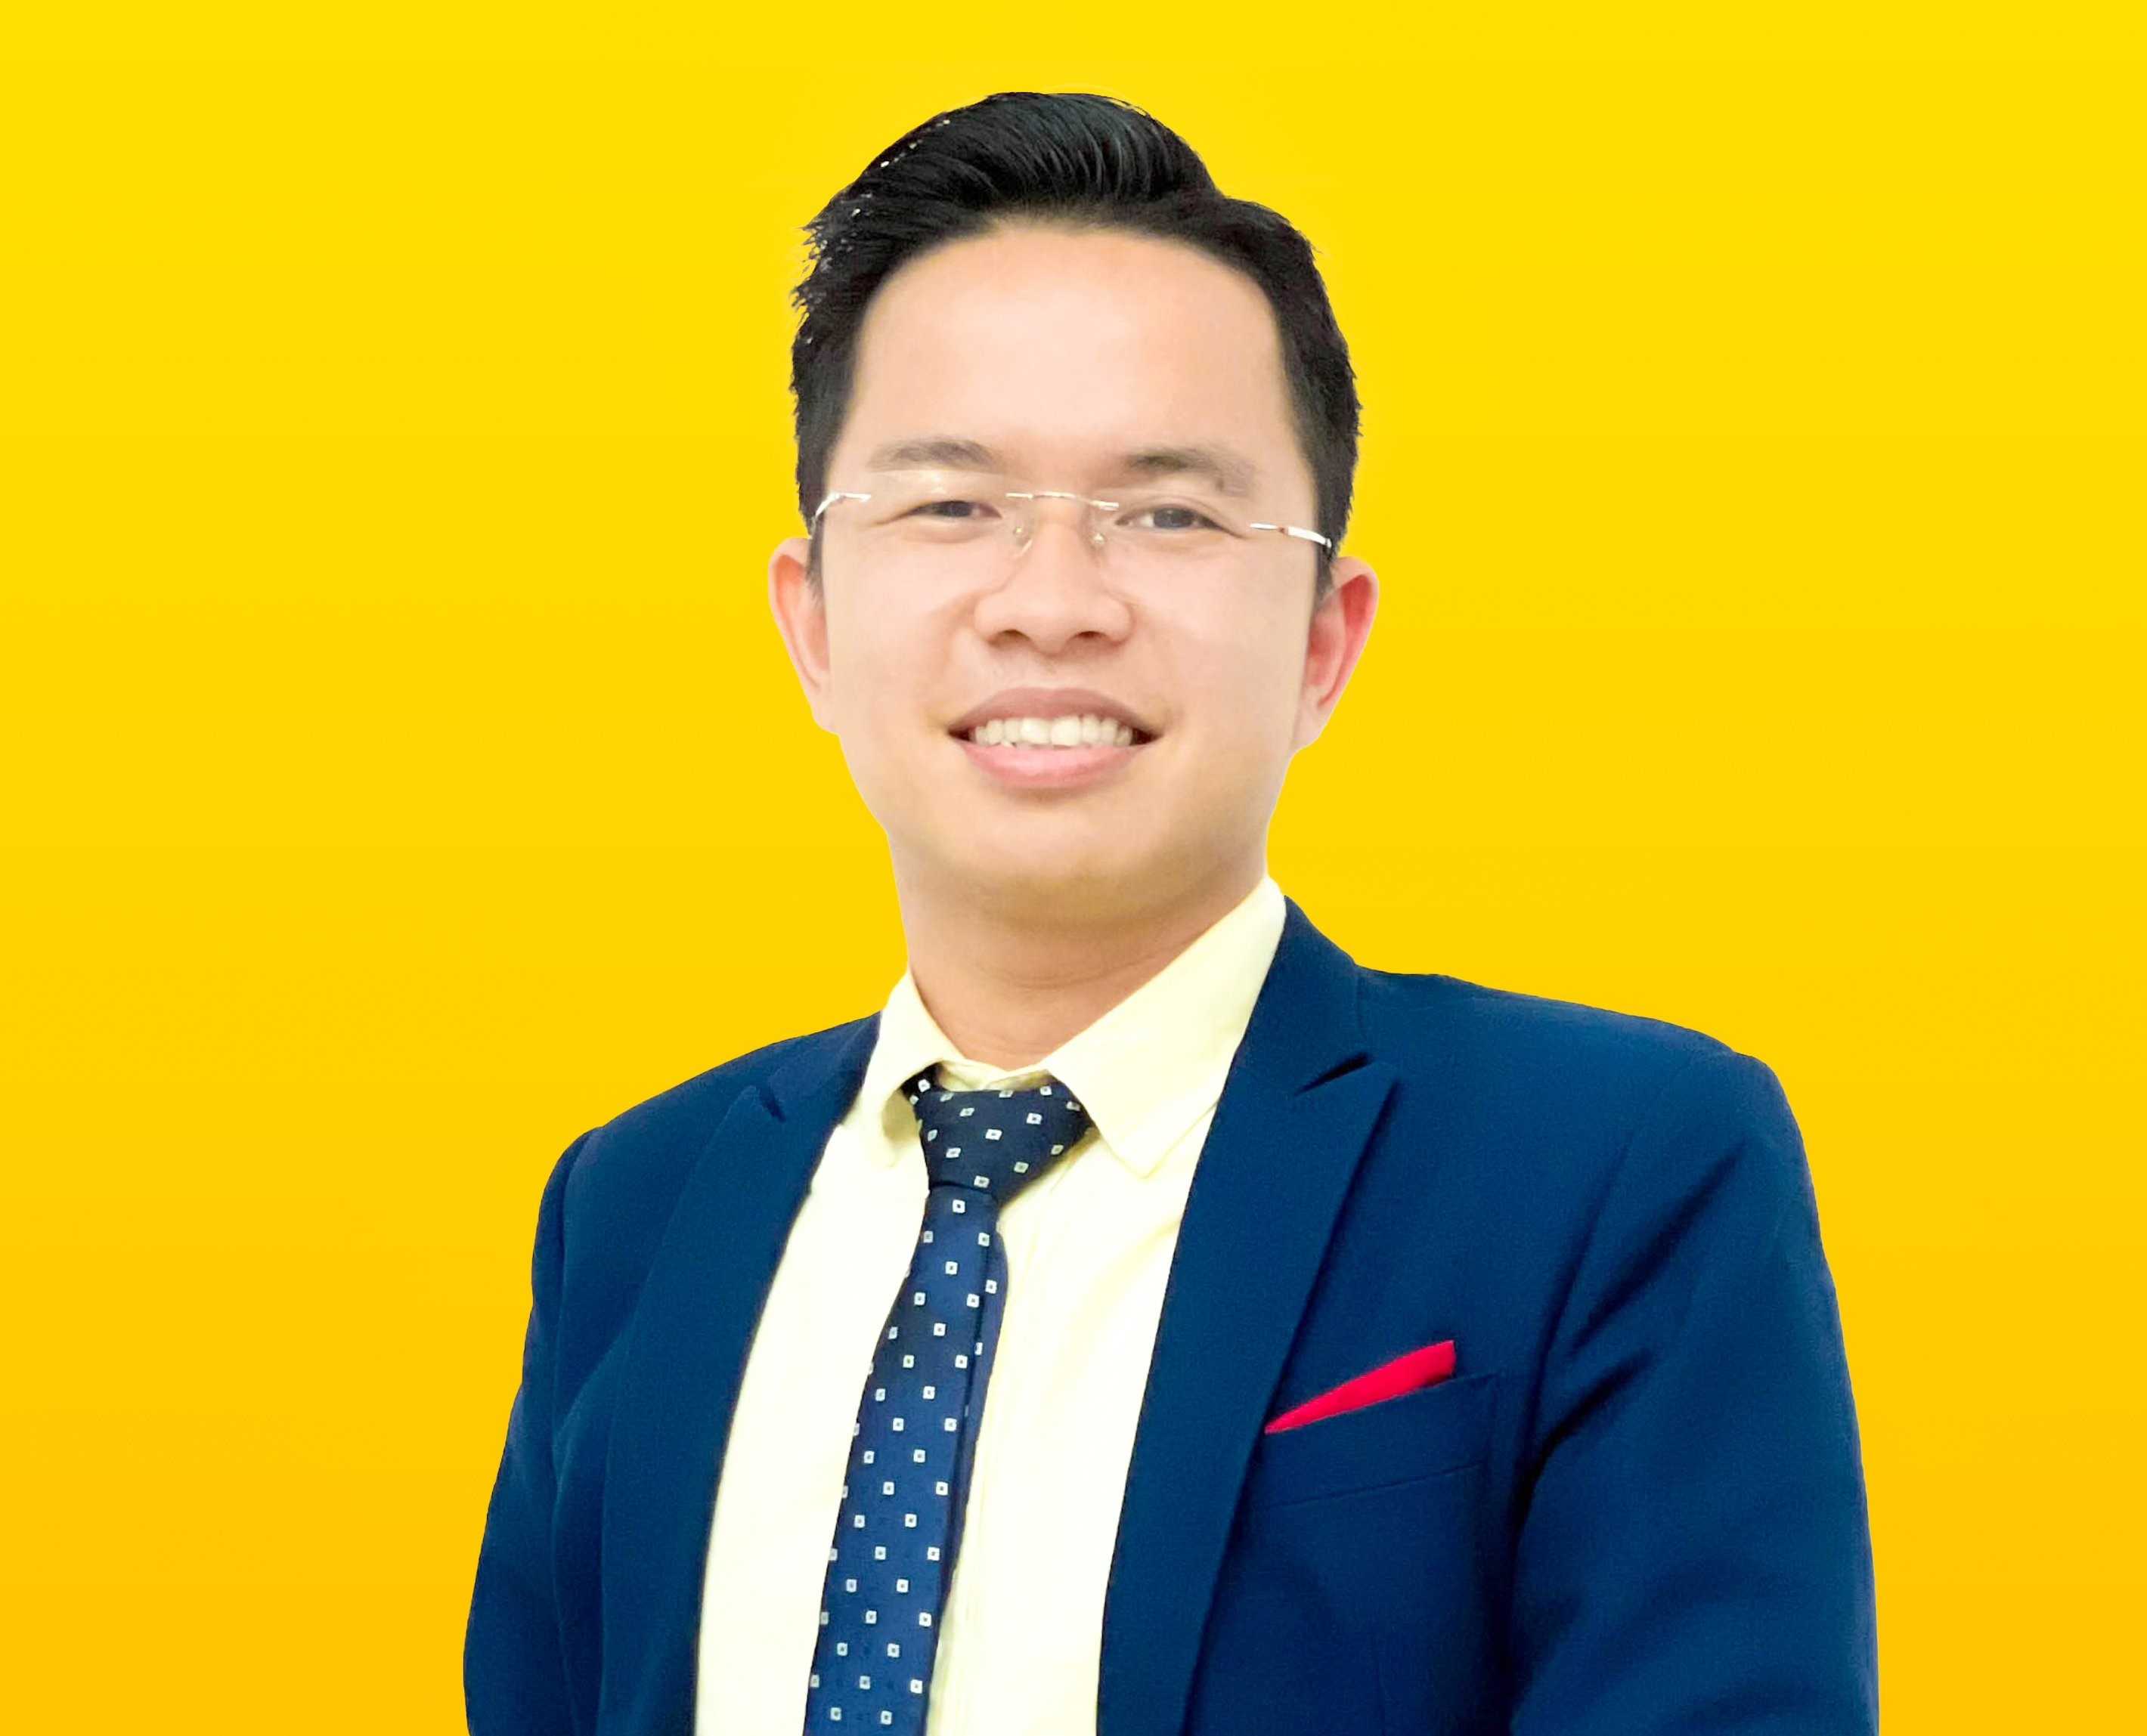 Mr. Bùi Văn Phái